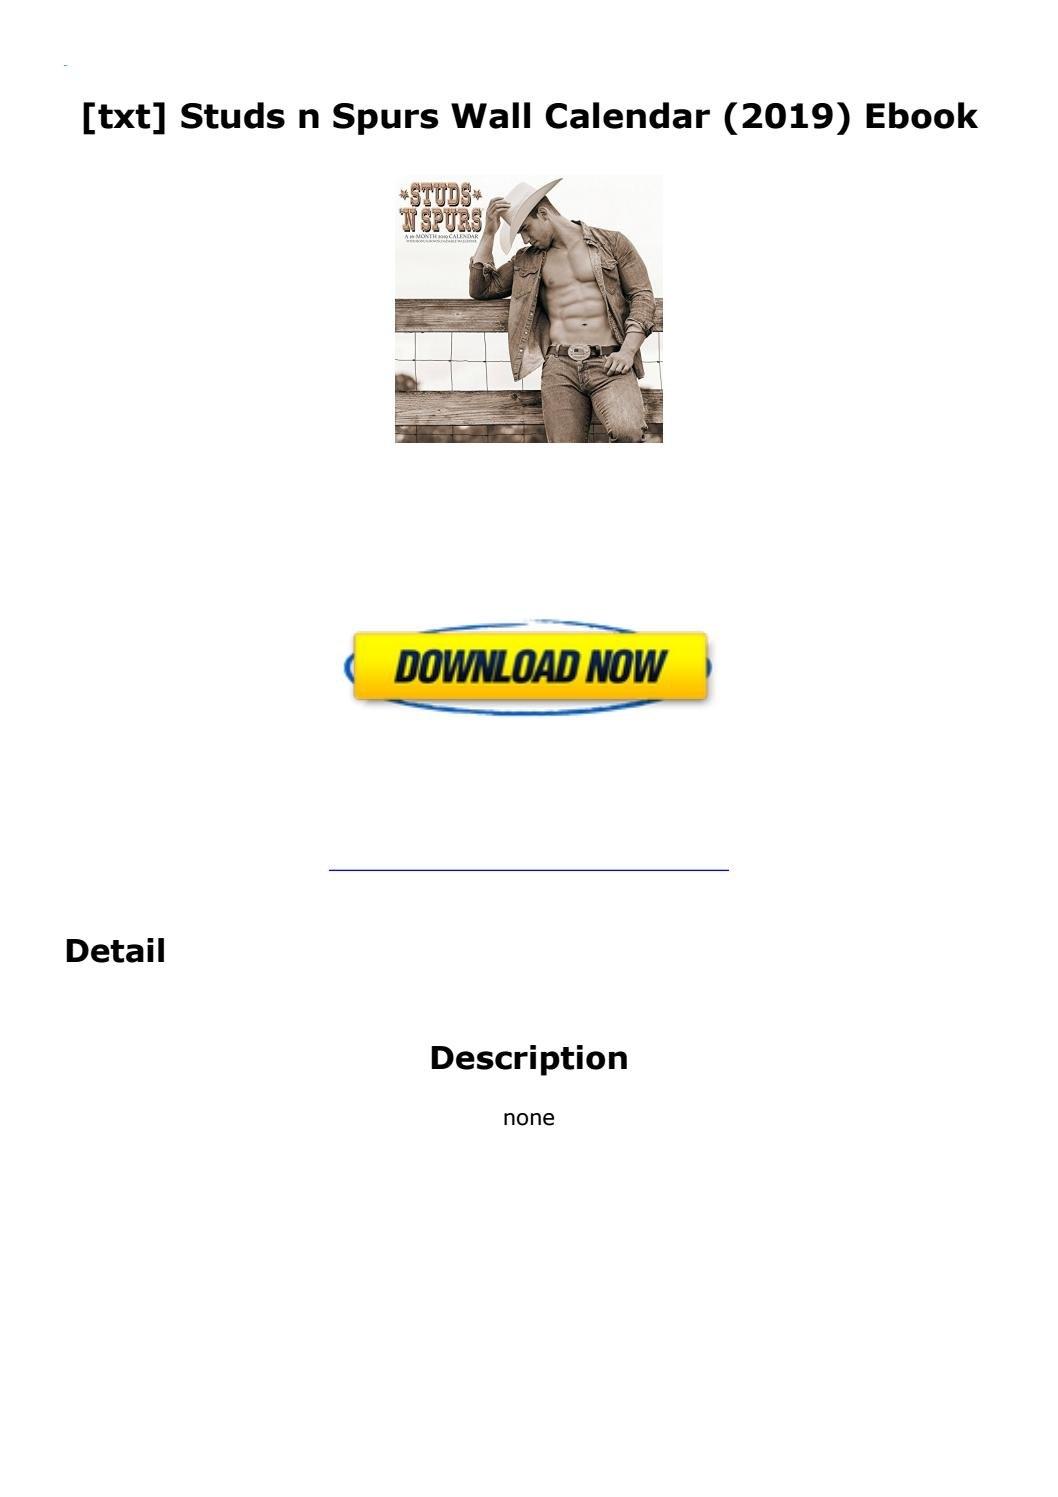 Txt] Studs N Spurs Wall Calendar (2019) Ebookemlpro437 - Issuu Studs N Spurs Calendar 2019